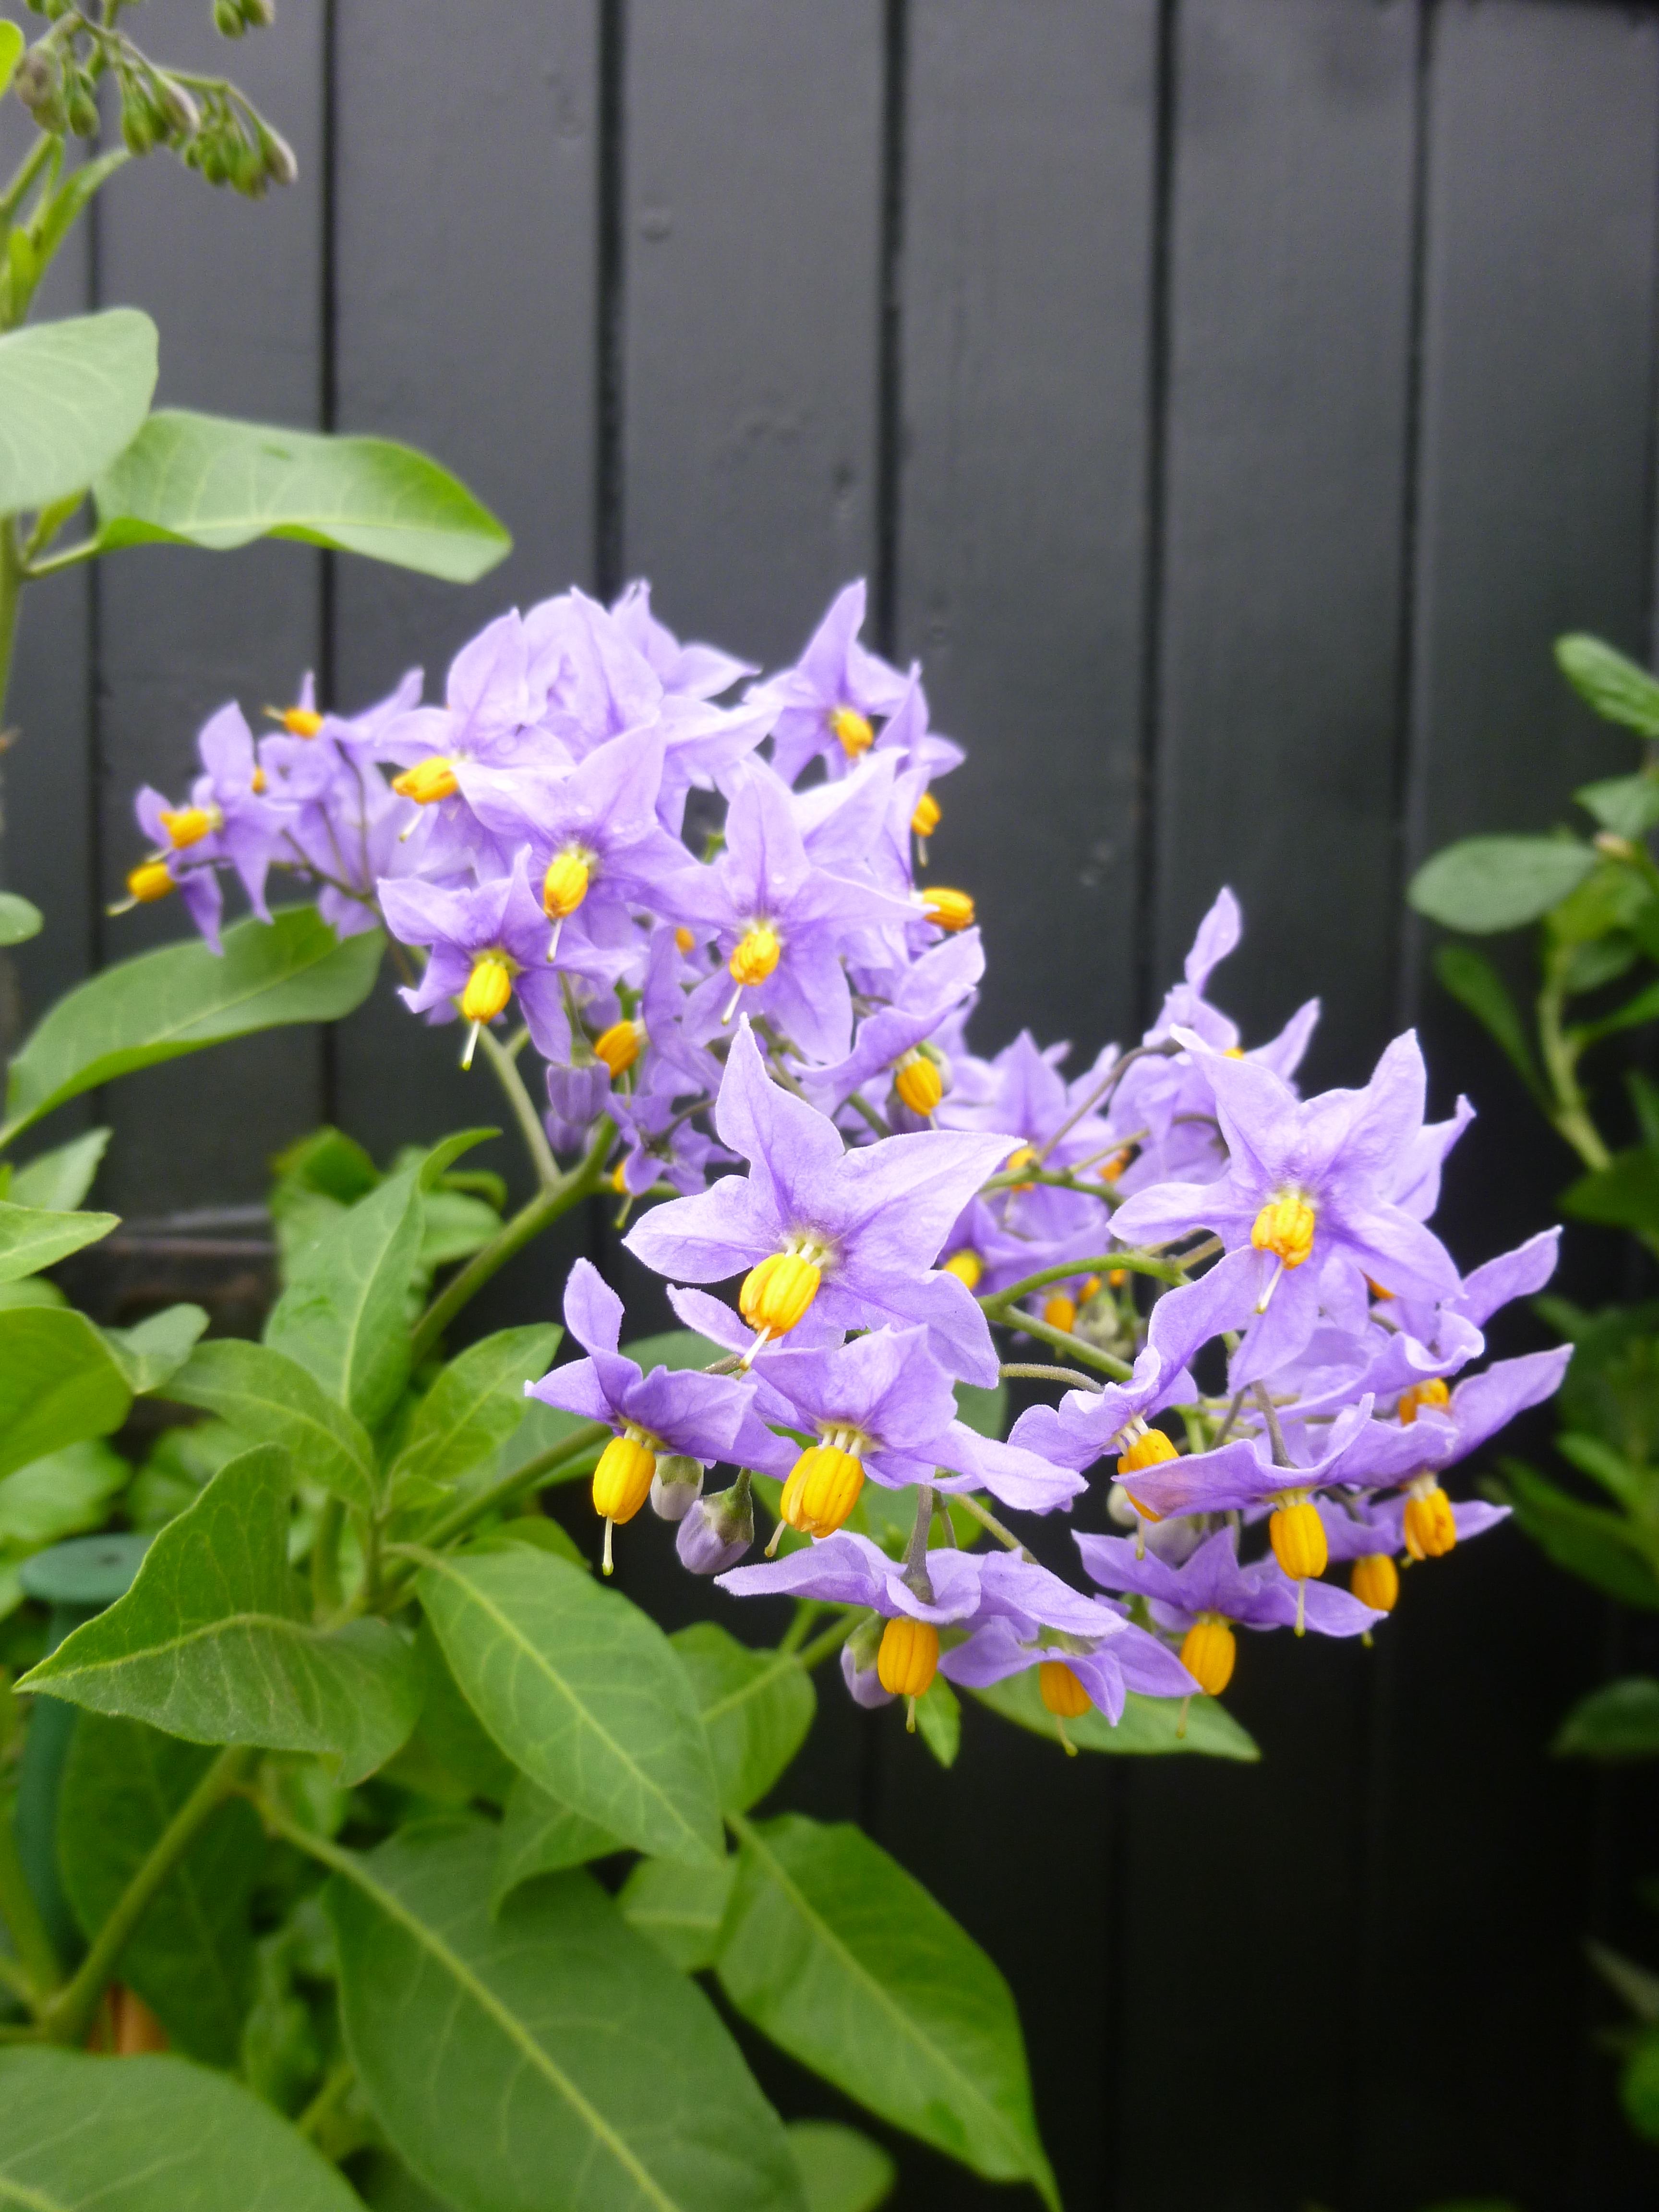 Solanum crispum glasnevin the beautiful blue potato vine the p1040576 izmirmasajfo